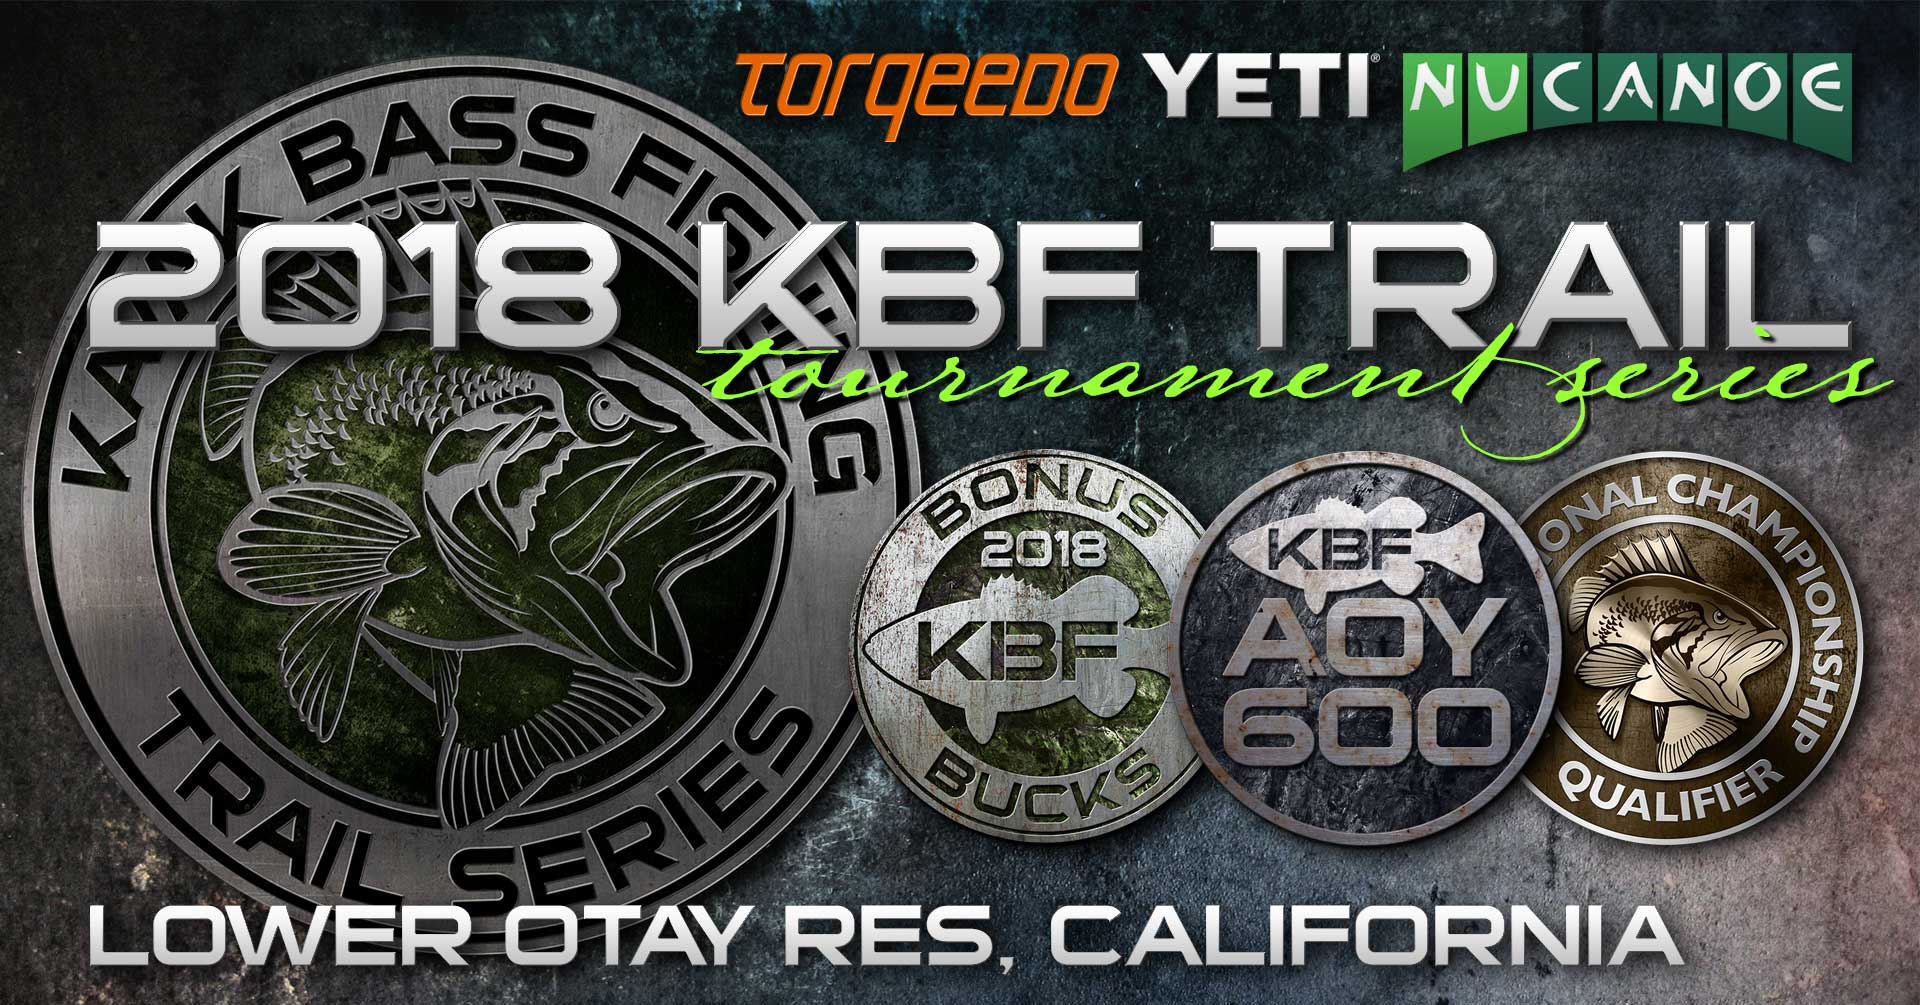 Lower Otay Res KBF TRAIL Series Tournament